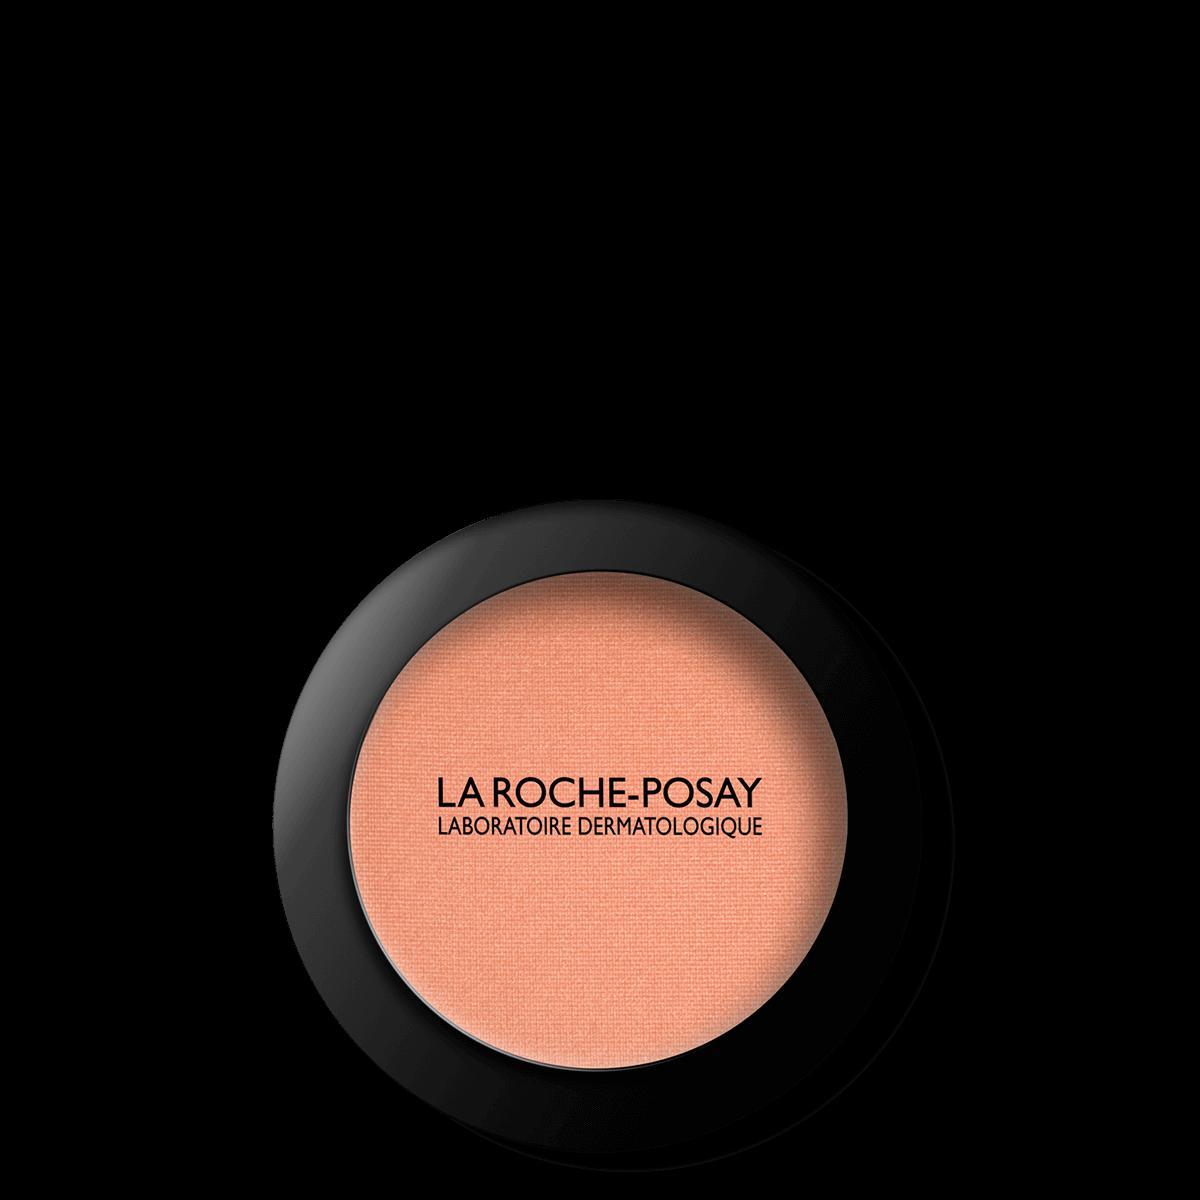 La Roche Posay Sensitiv Toleriane Sminke BLUSH CopperBronze 33378724